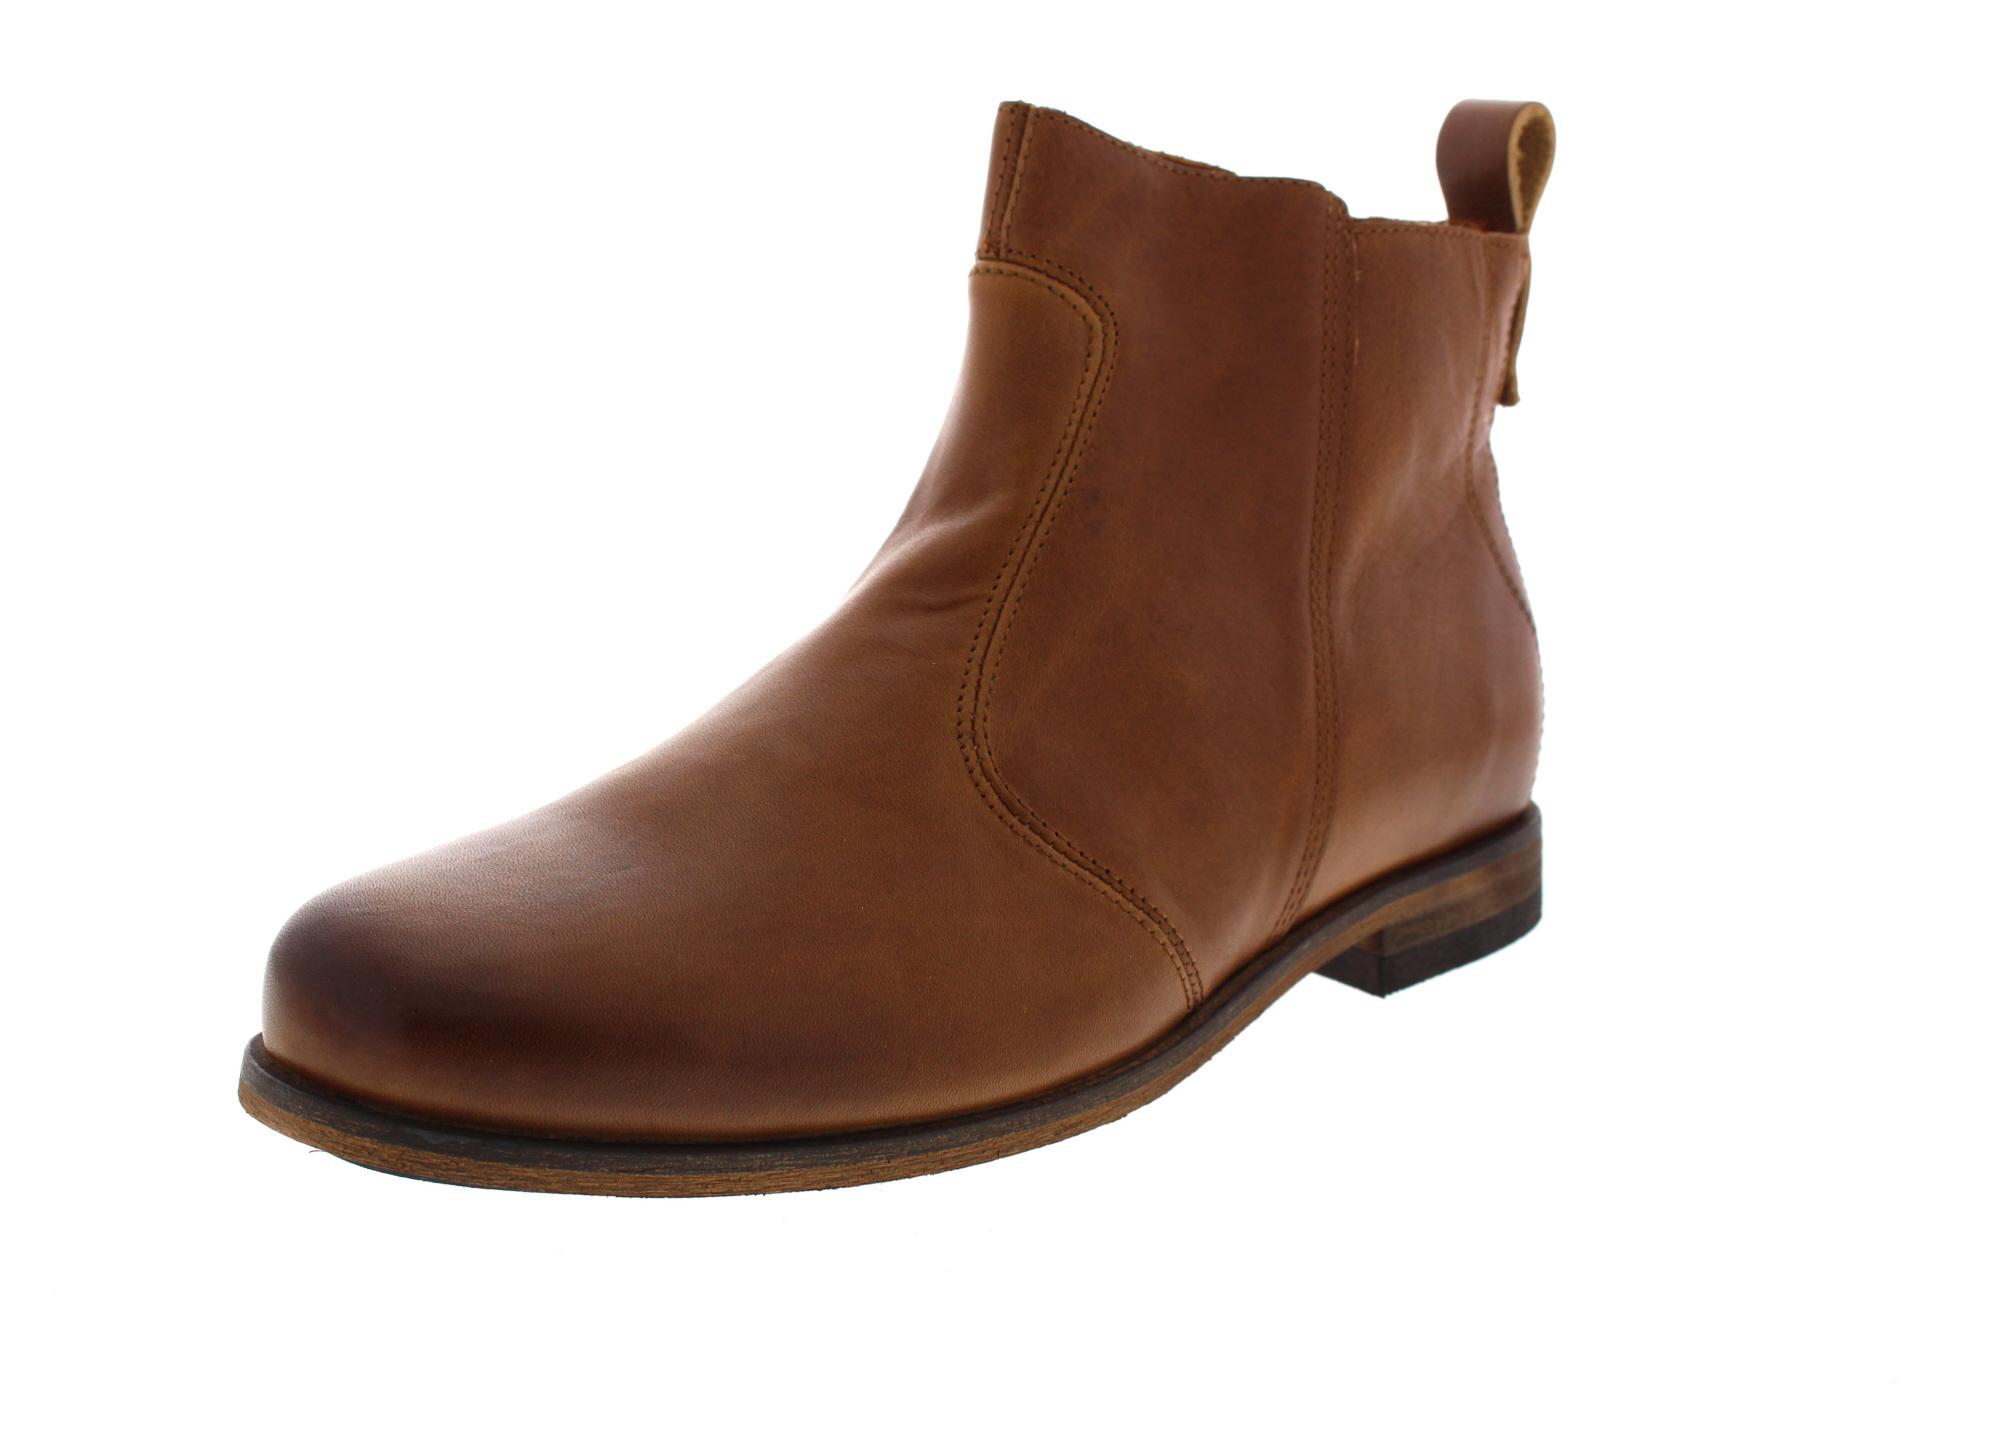 HAGHE by HUB Herrenschuhe - Boots SAVEA - cognac0-6708